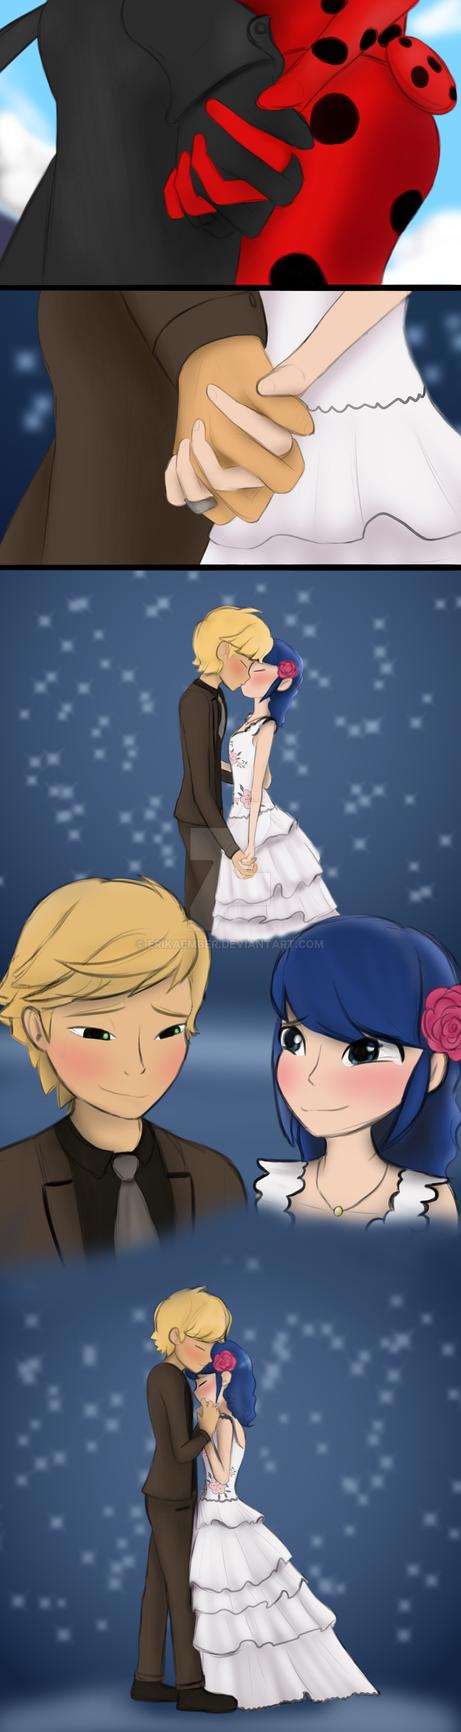 (ML OBLIVIO SPOILER) LadyNoir kiss scene redrawn by ErikaEmber